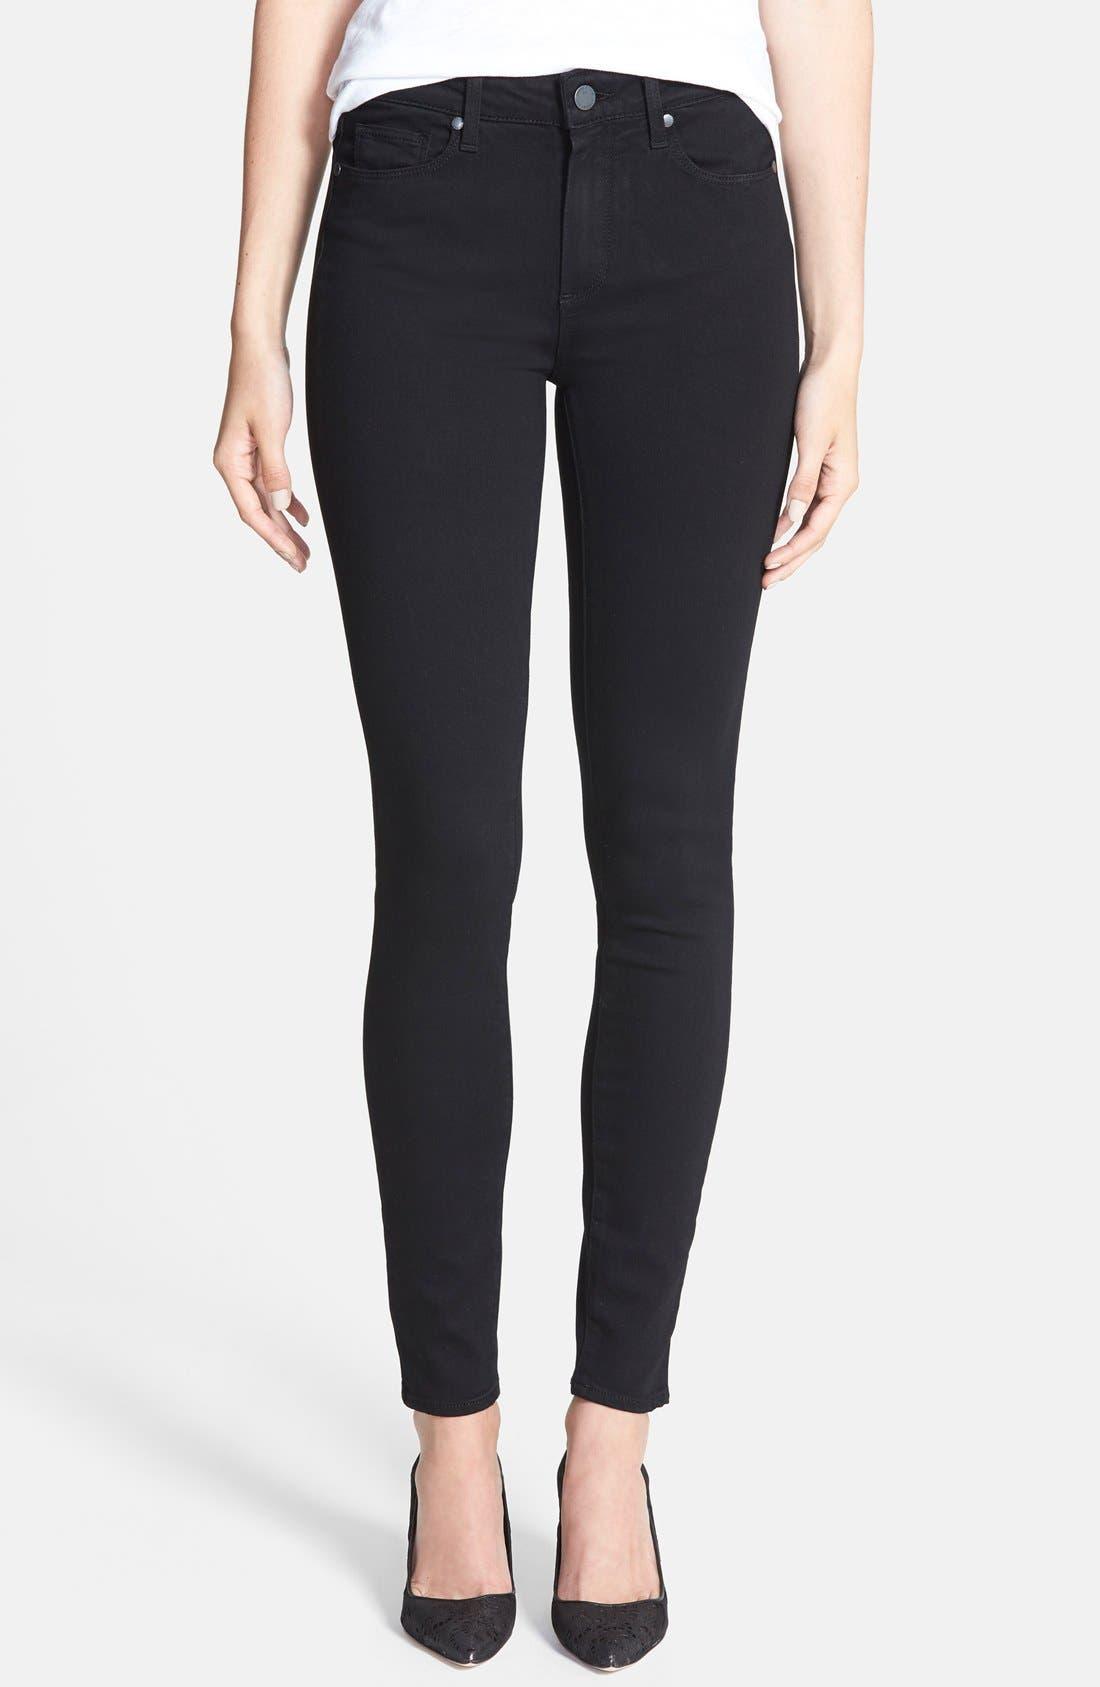 PAIGE Transcend - Hoxton High Waist Ultra Skinny Stretch Jeans (Black Shadow)